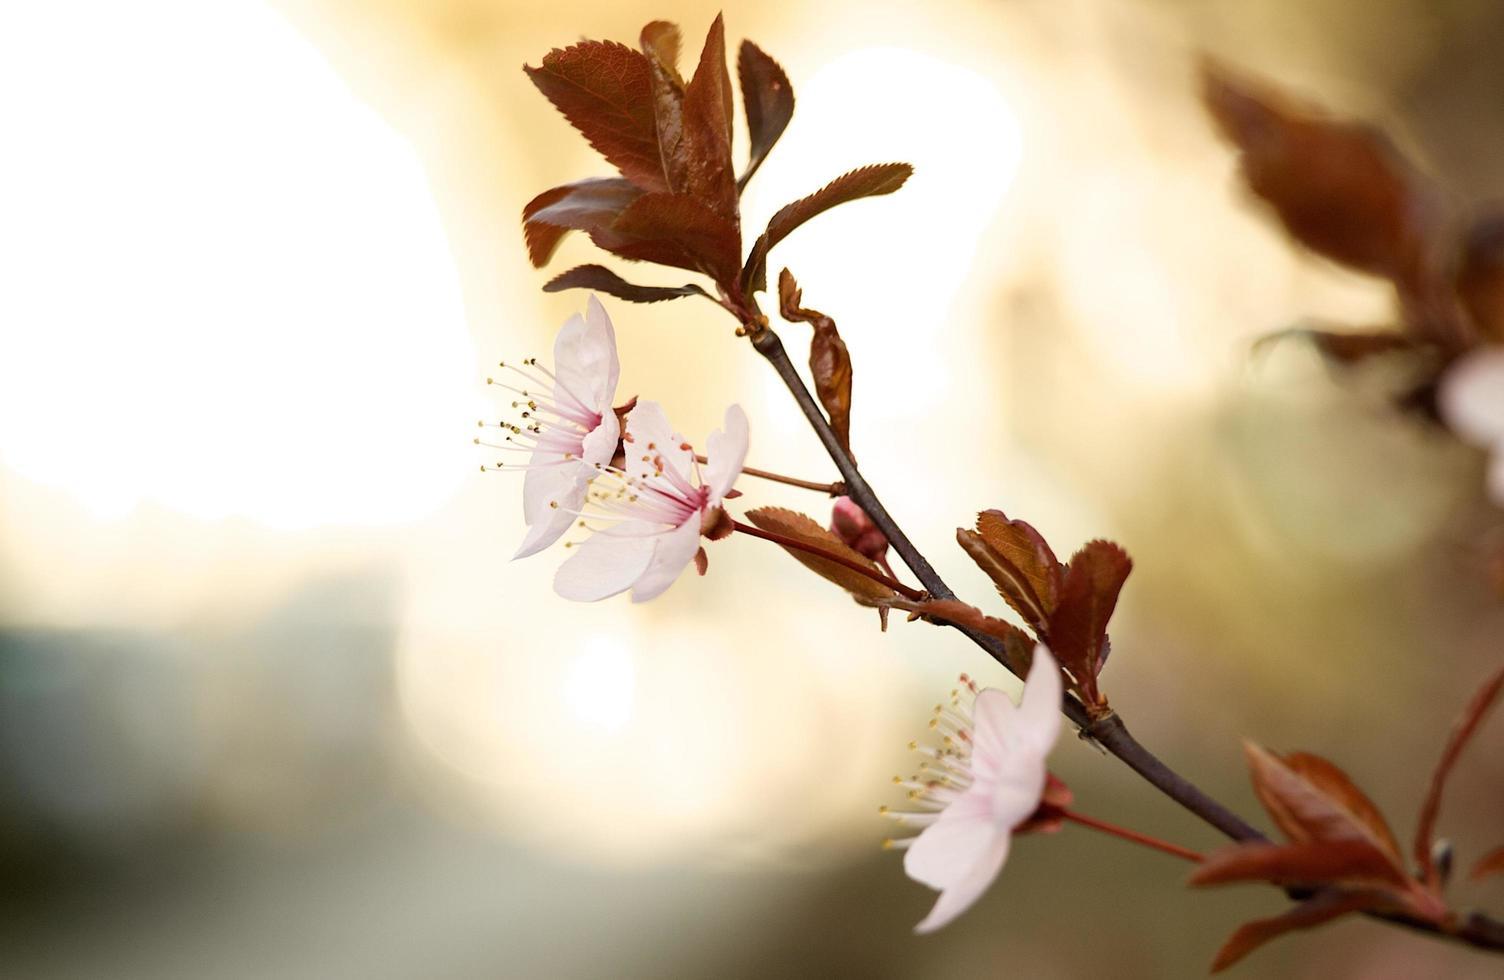 Pastel wildflower in nature photo